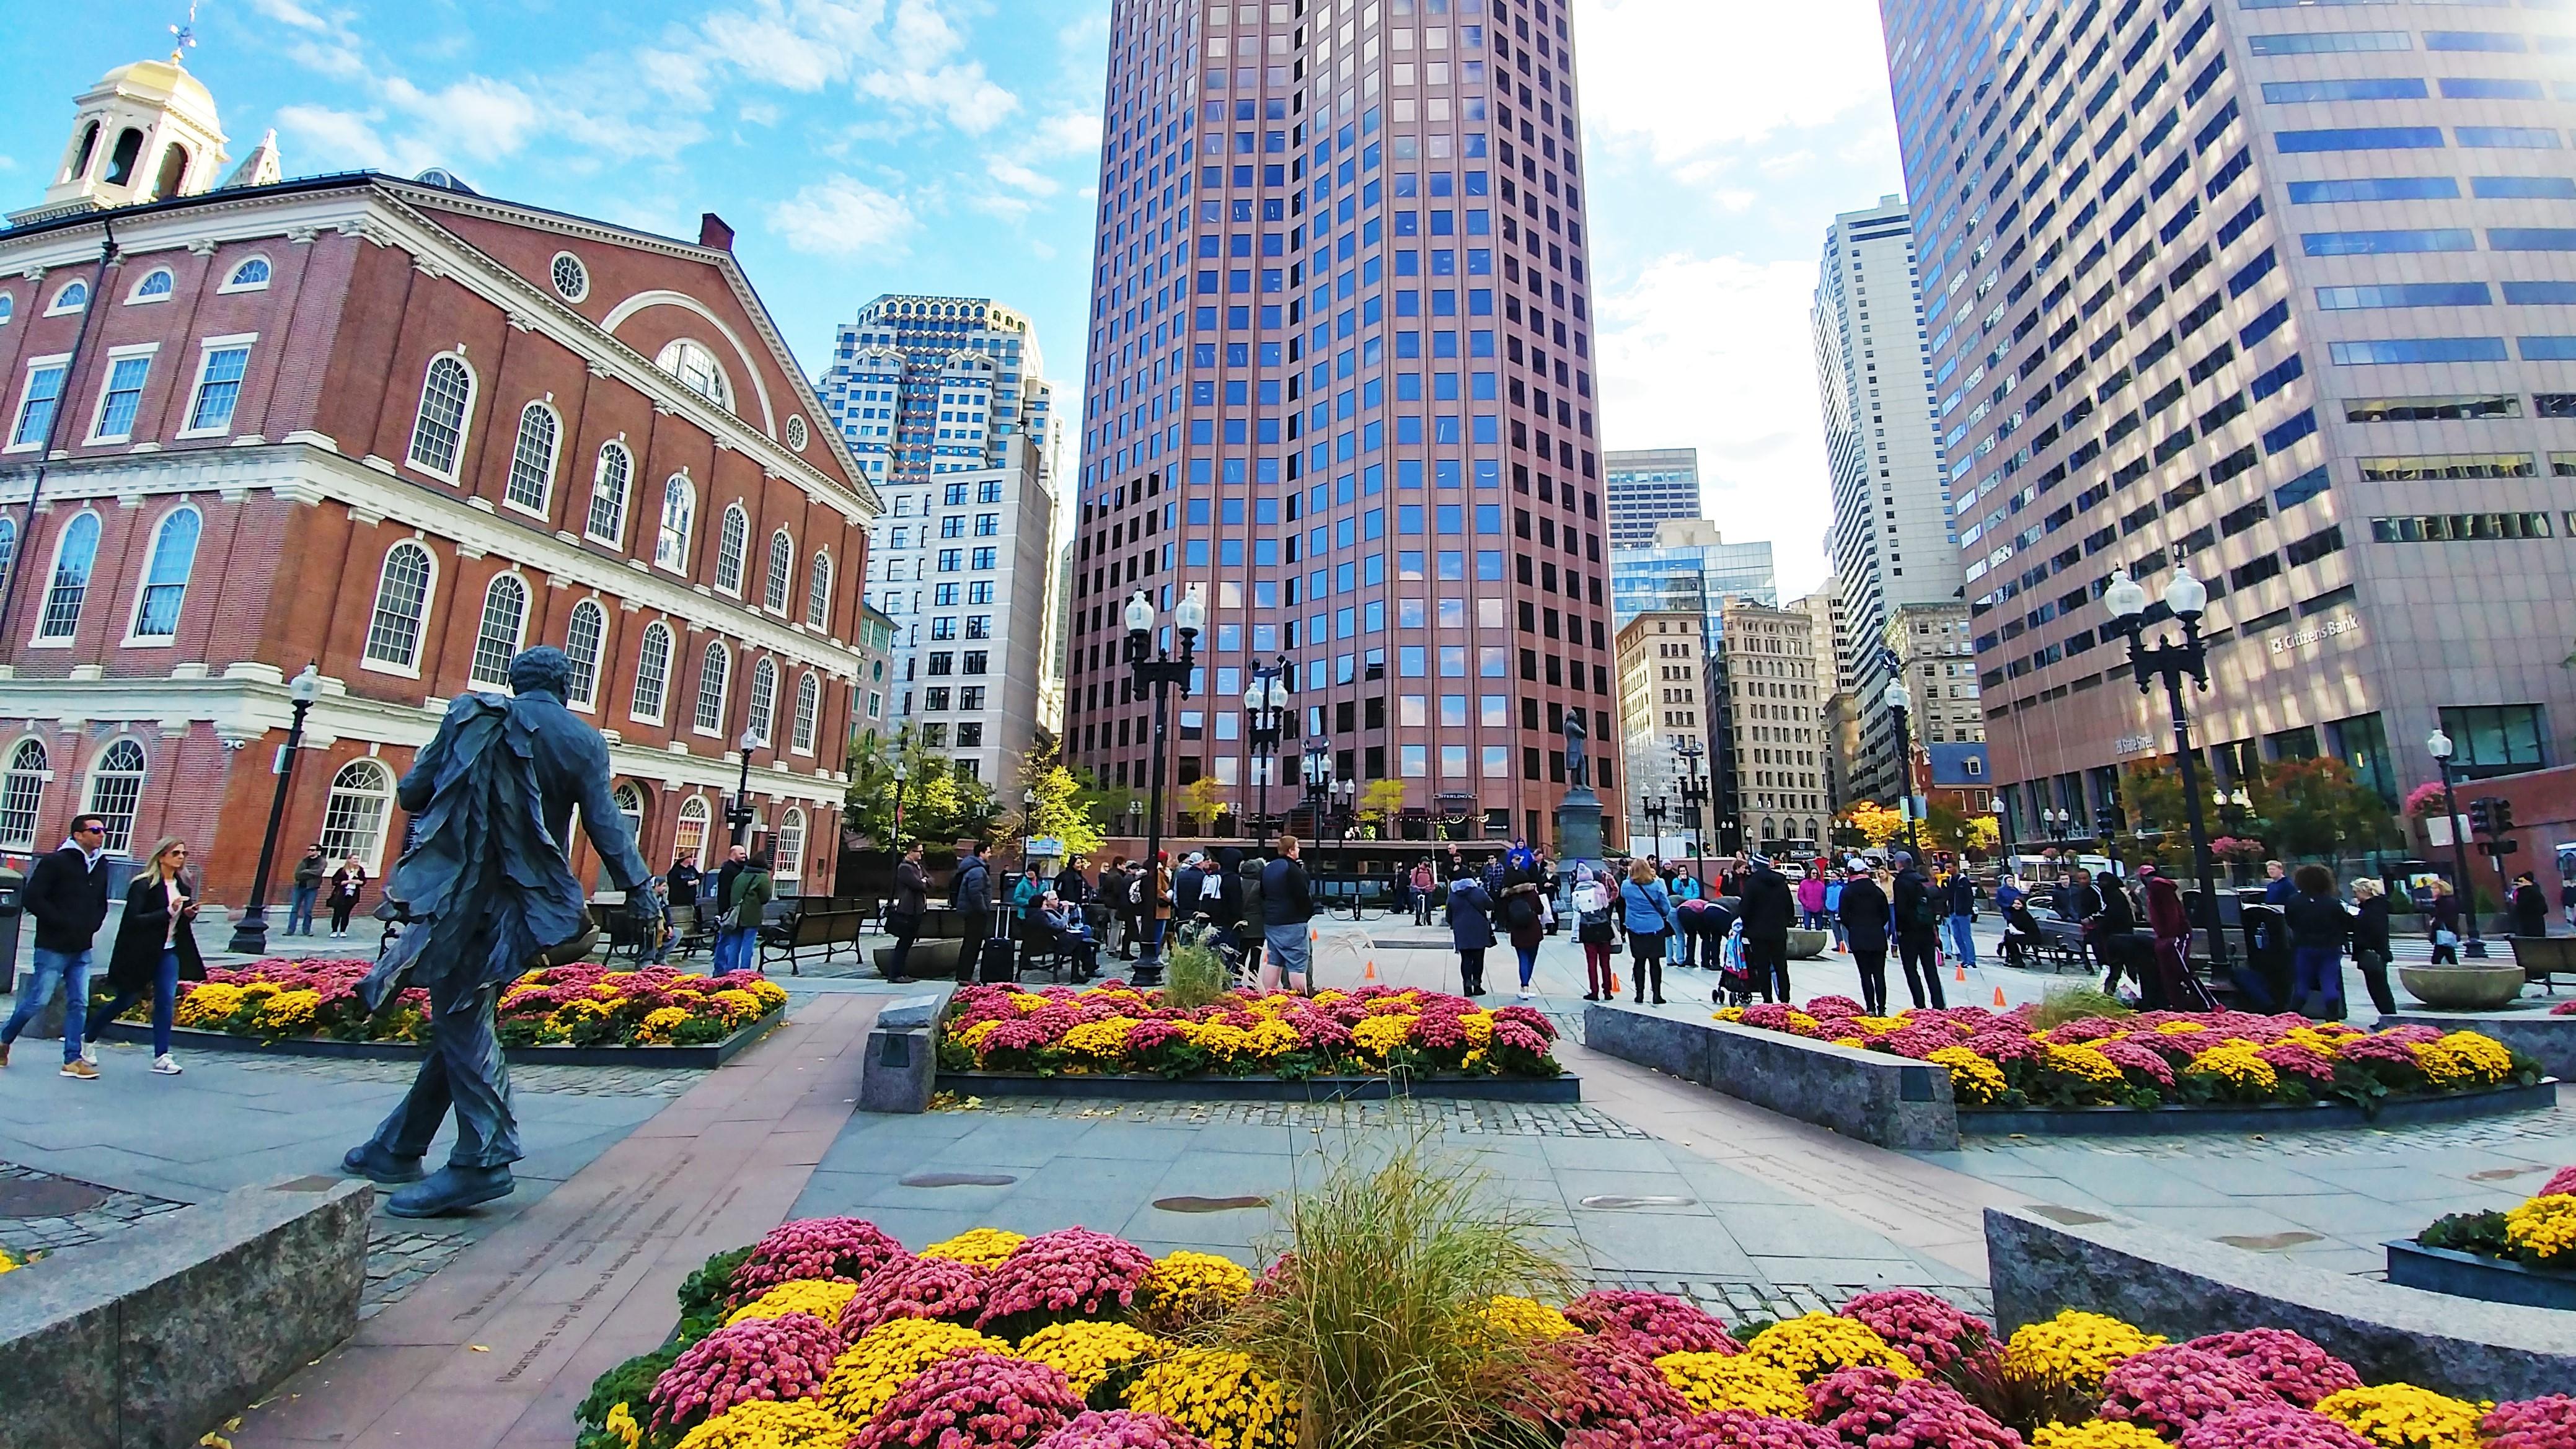 quincy market boston usa automne voyage road-trip blog arpenter le chemin (2)